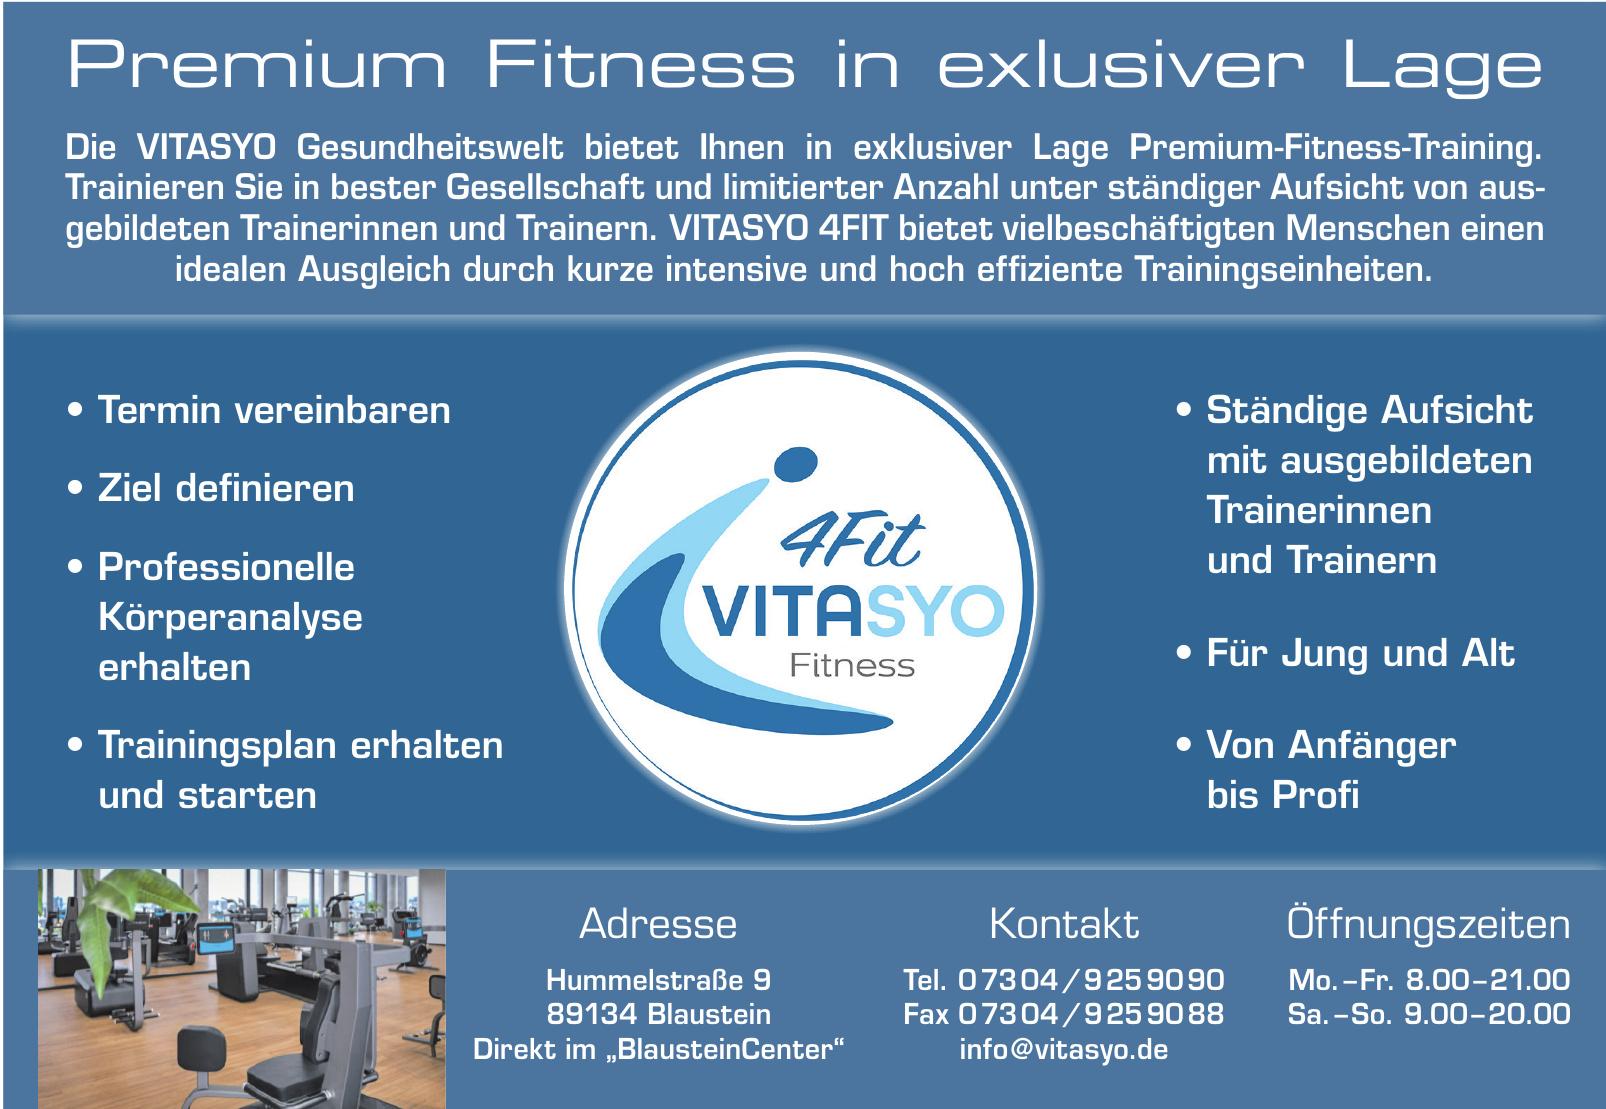 Premium Fitness Vitasyo